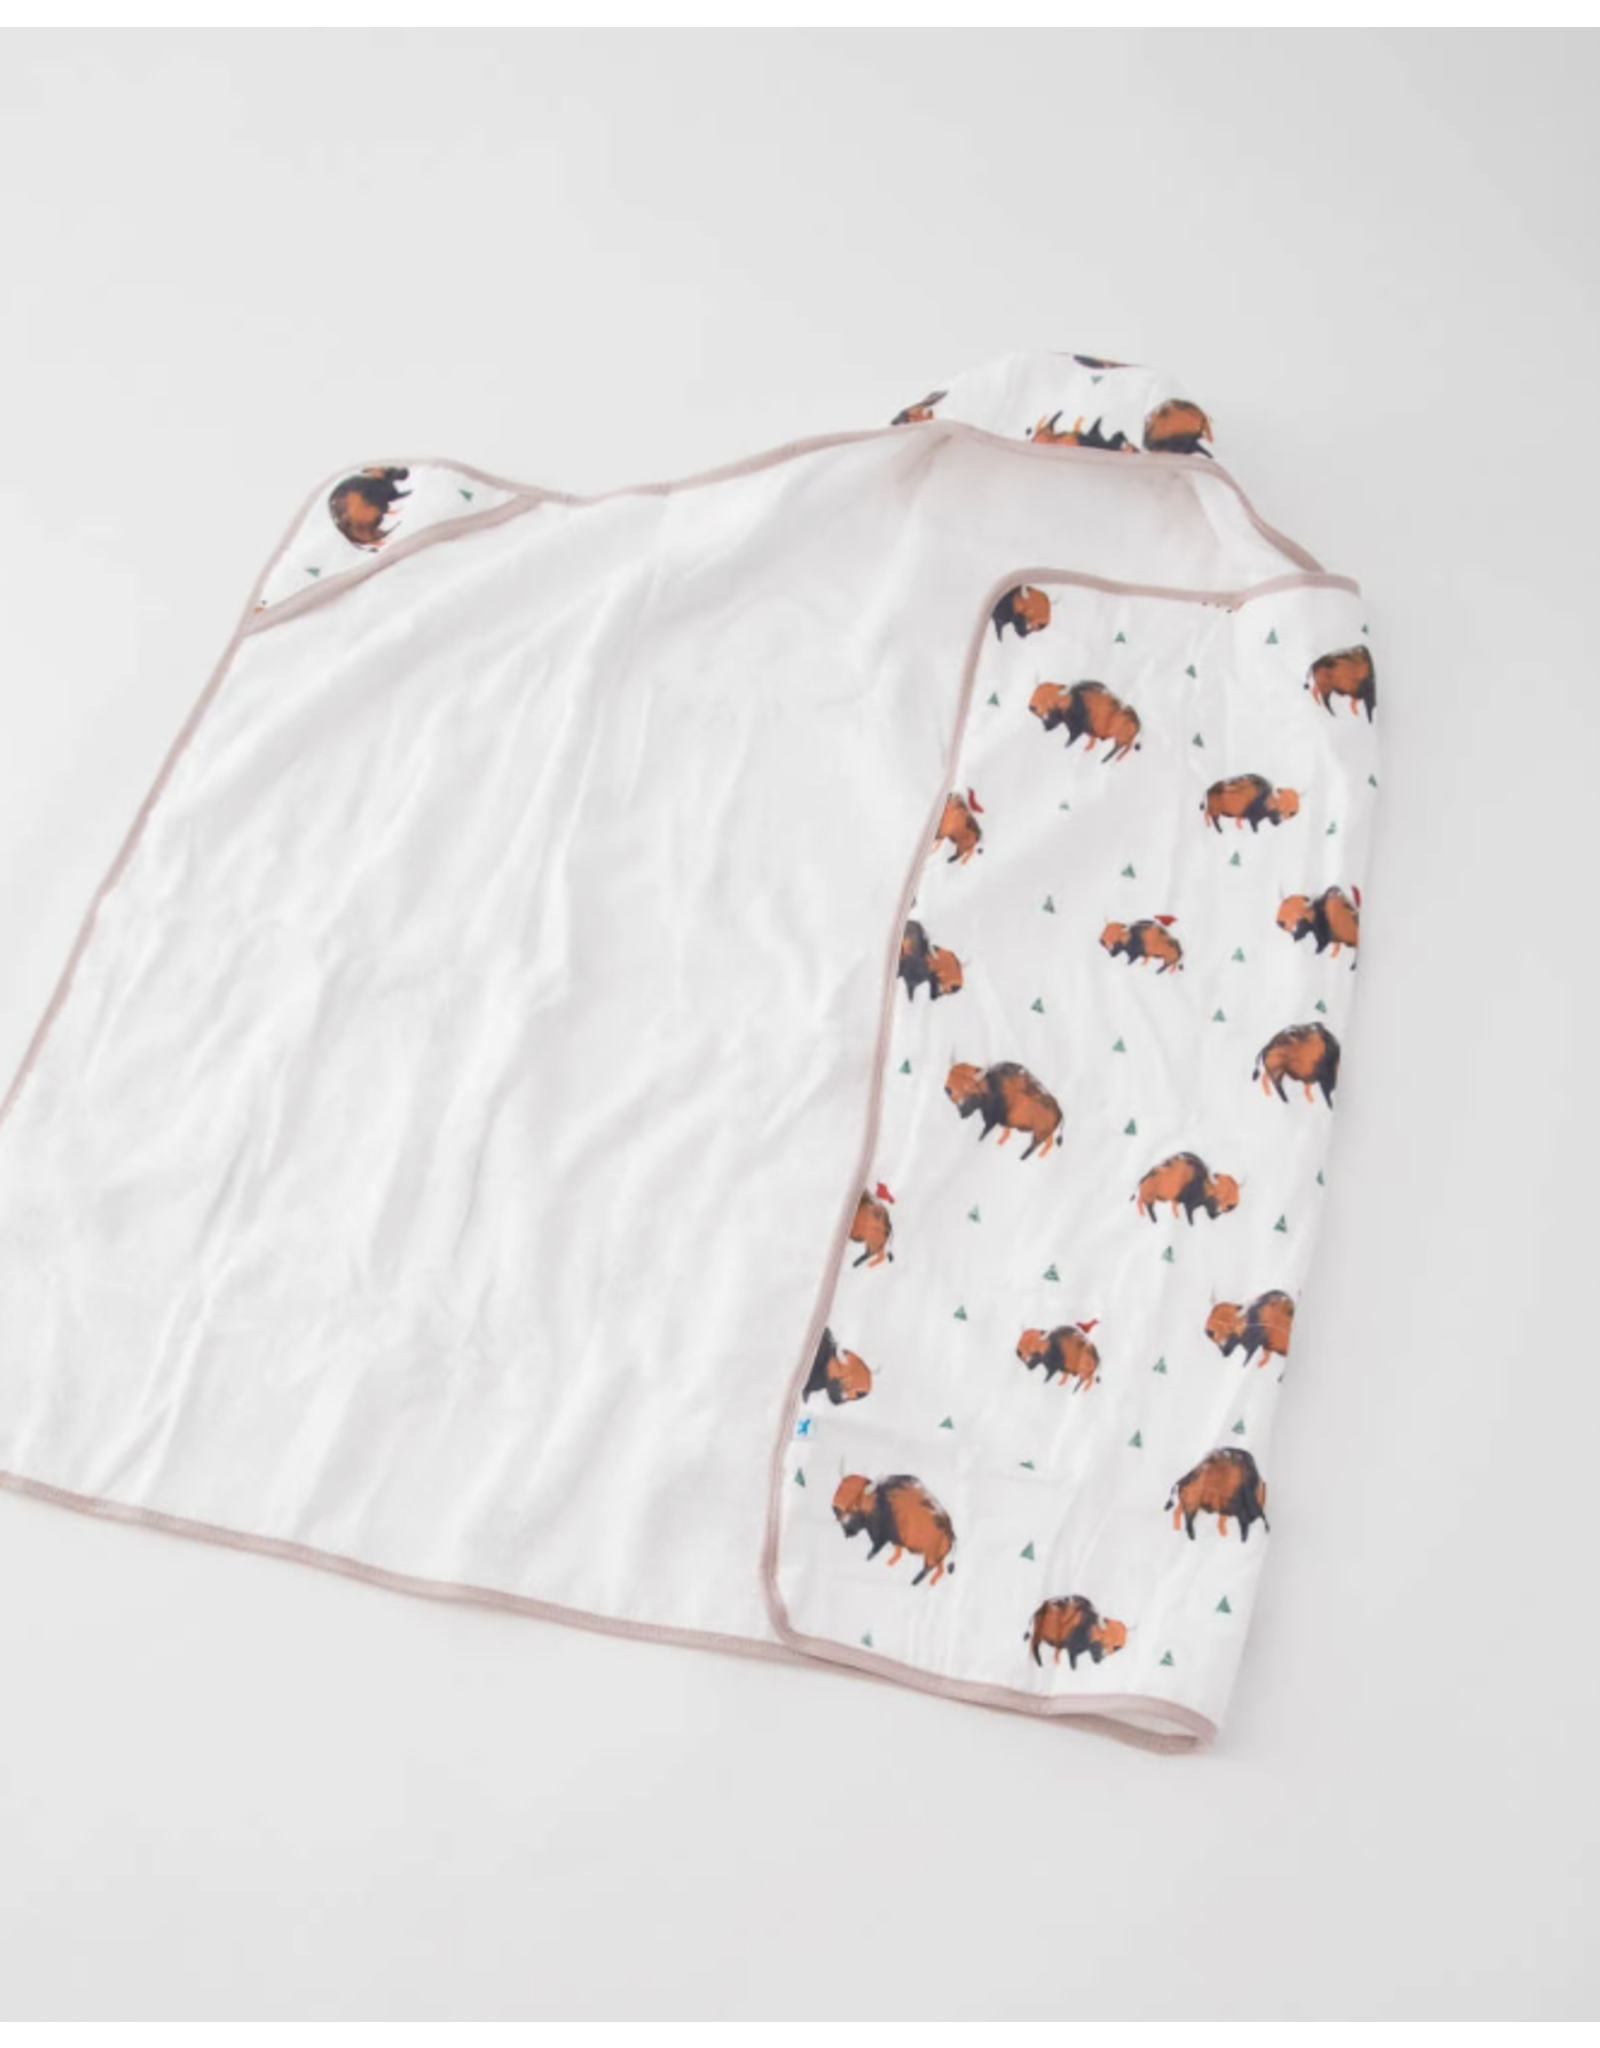 Little Unicorn, LLC Cotton Hooded Towel Big Kid, Bison